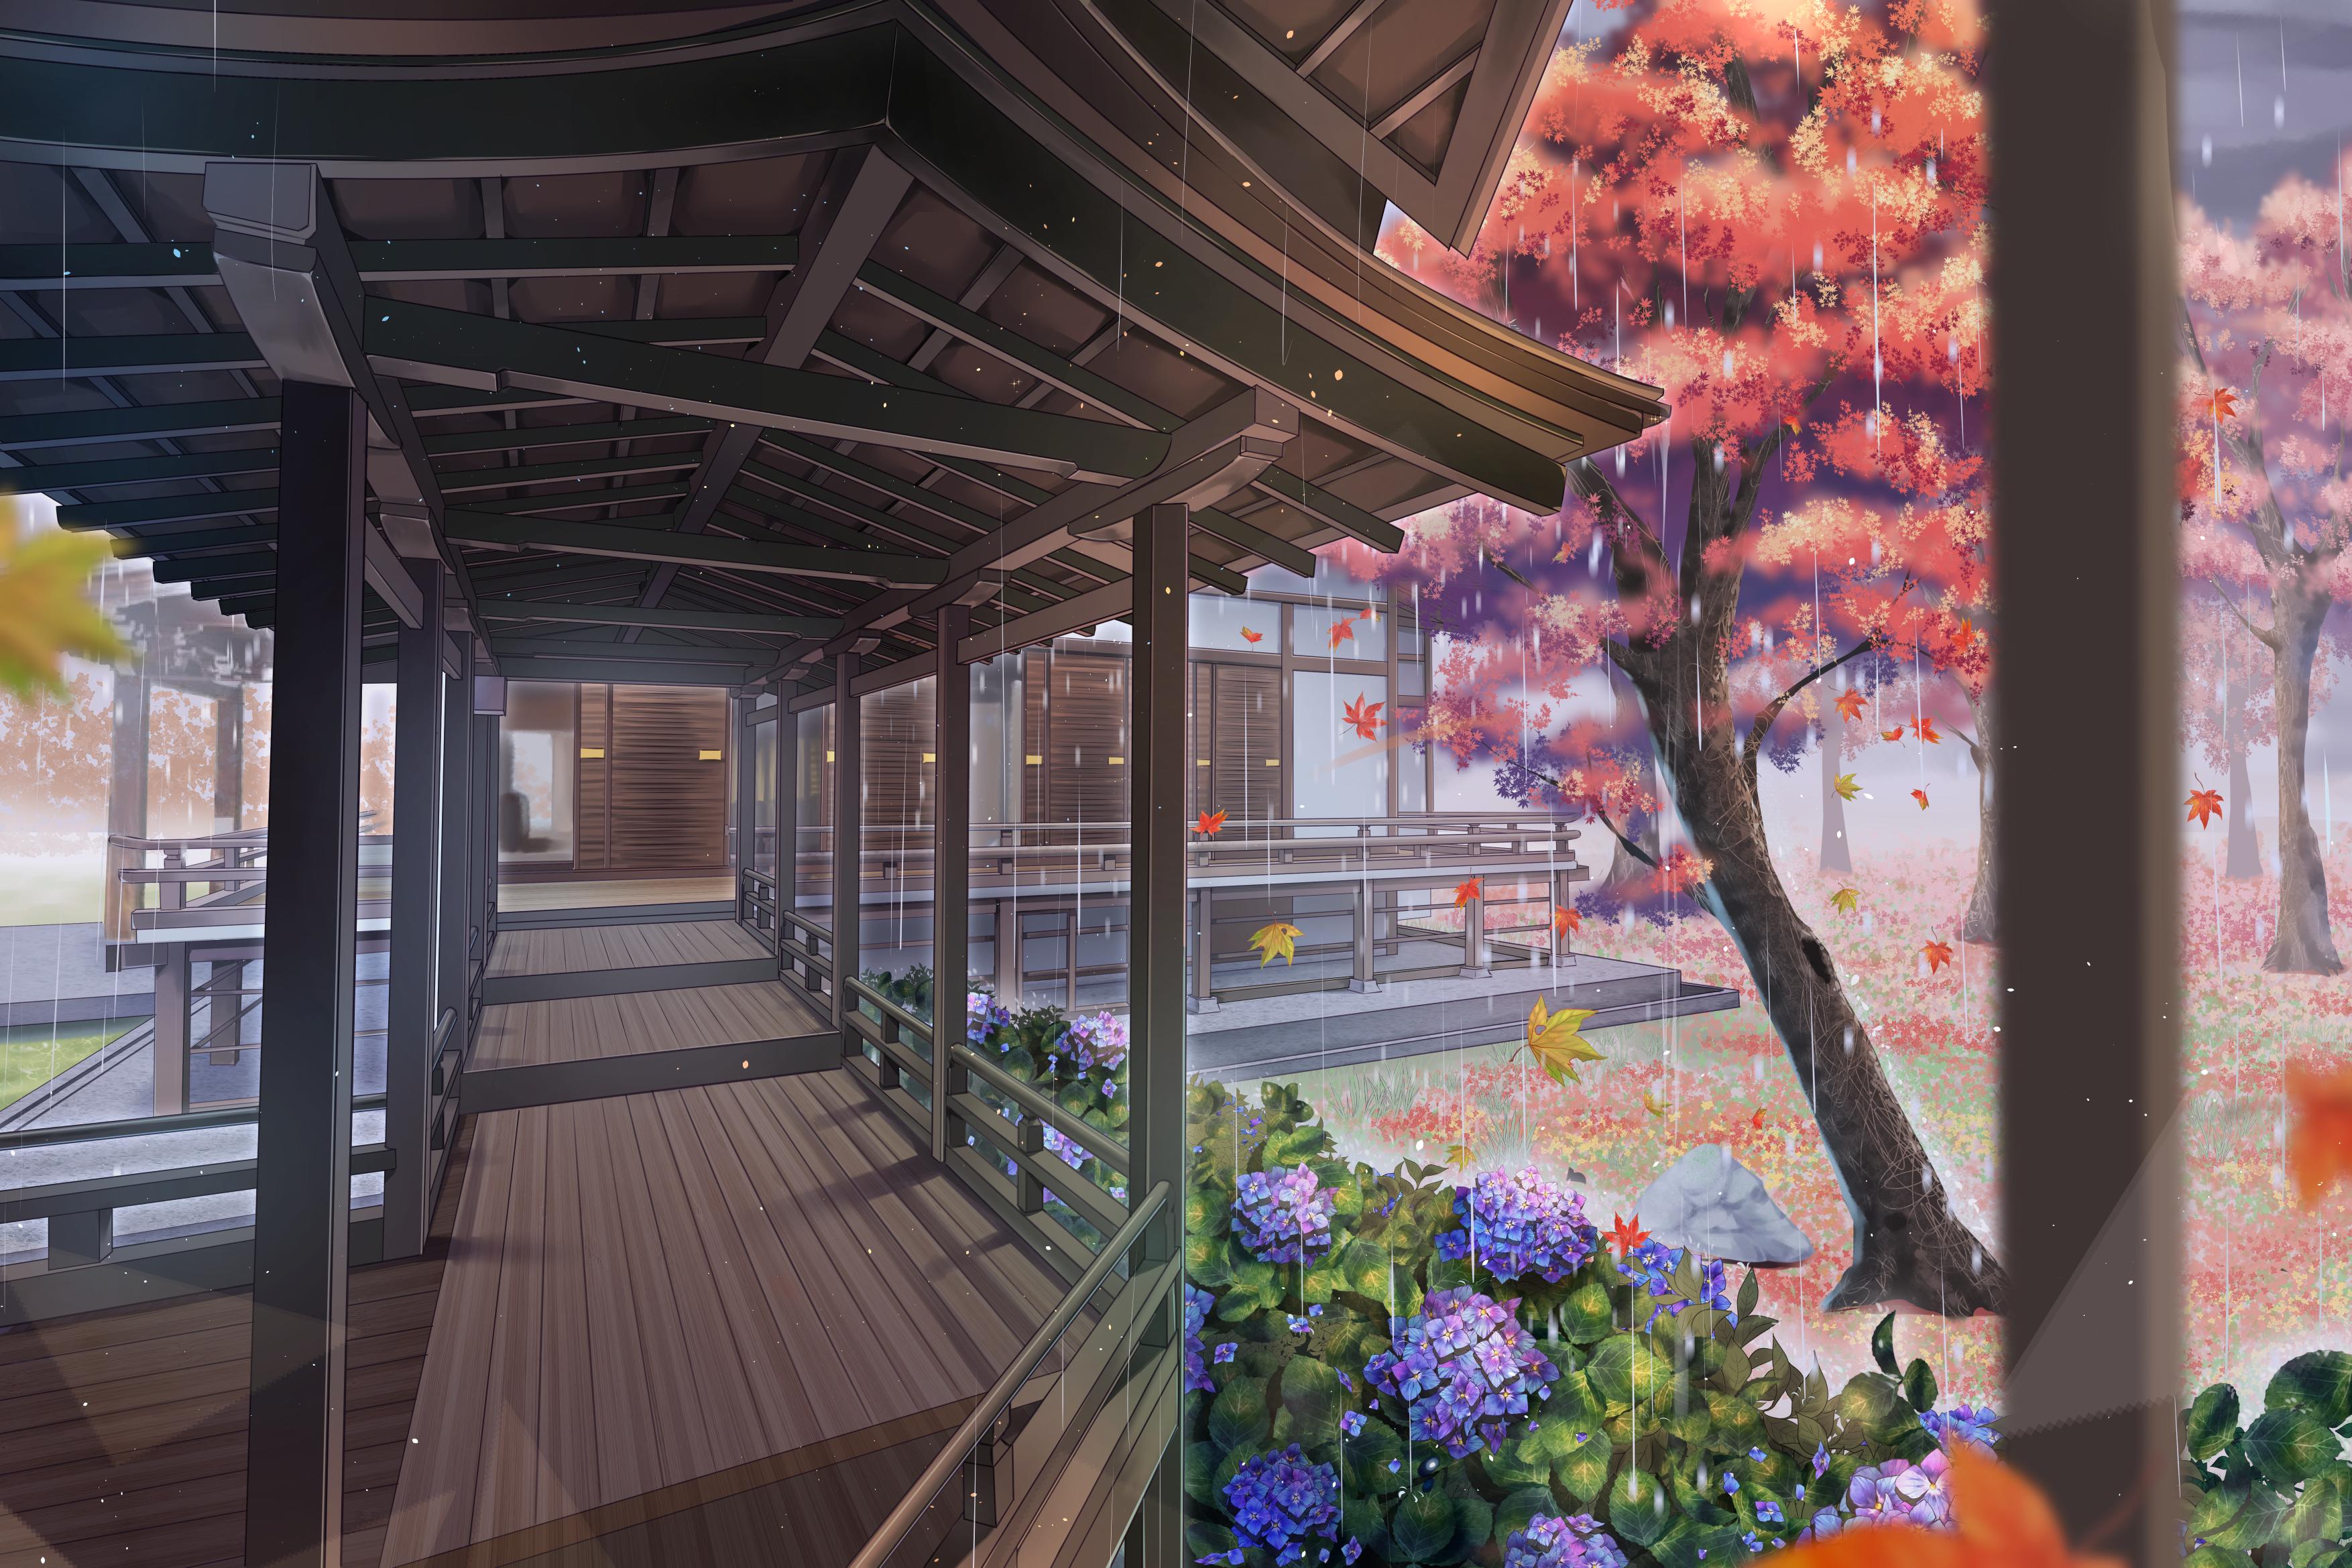 Building Flower Hydrangea Rain Tree 3508x2339